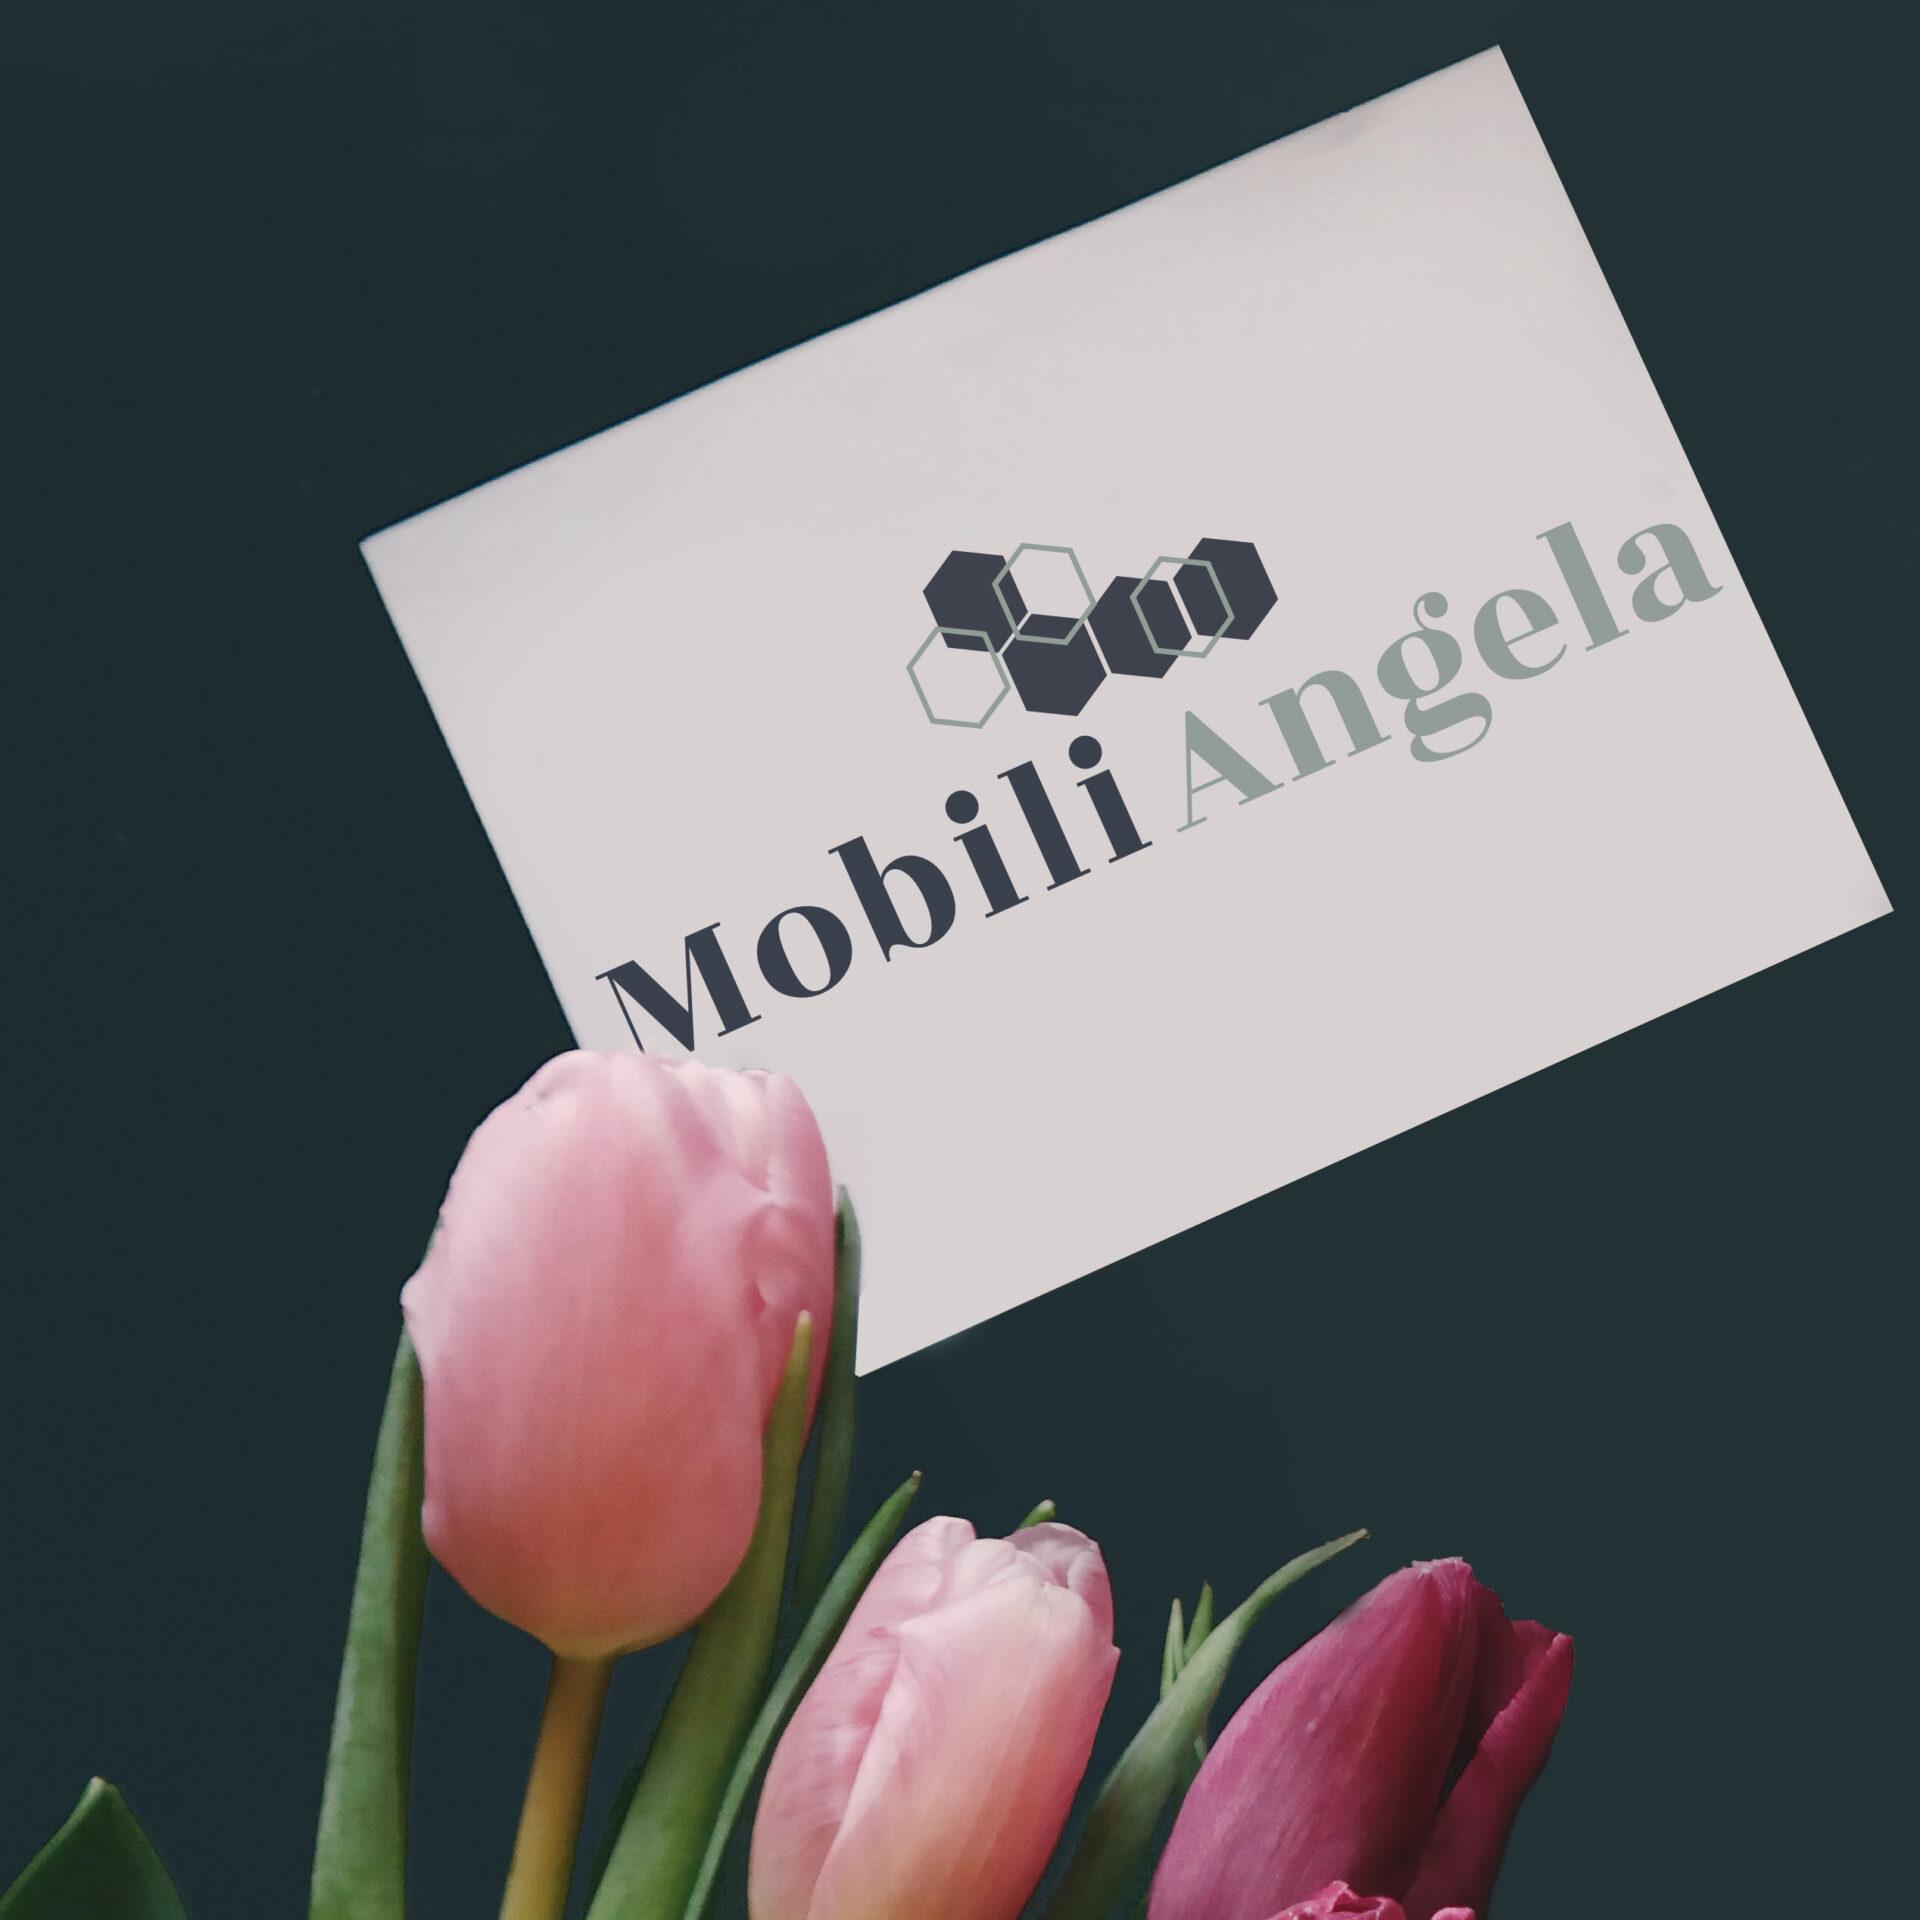 Biglietto da visita logo Mobili Angela